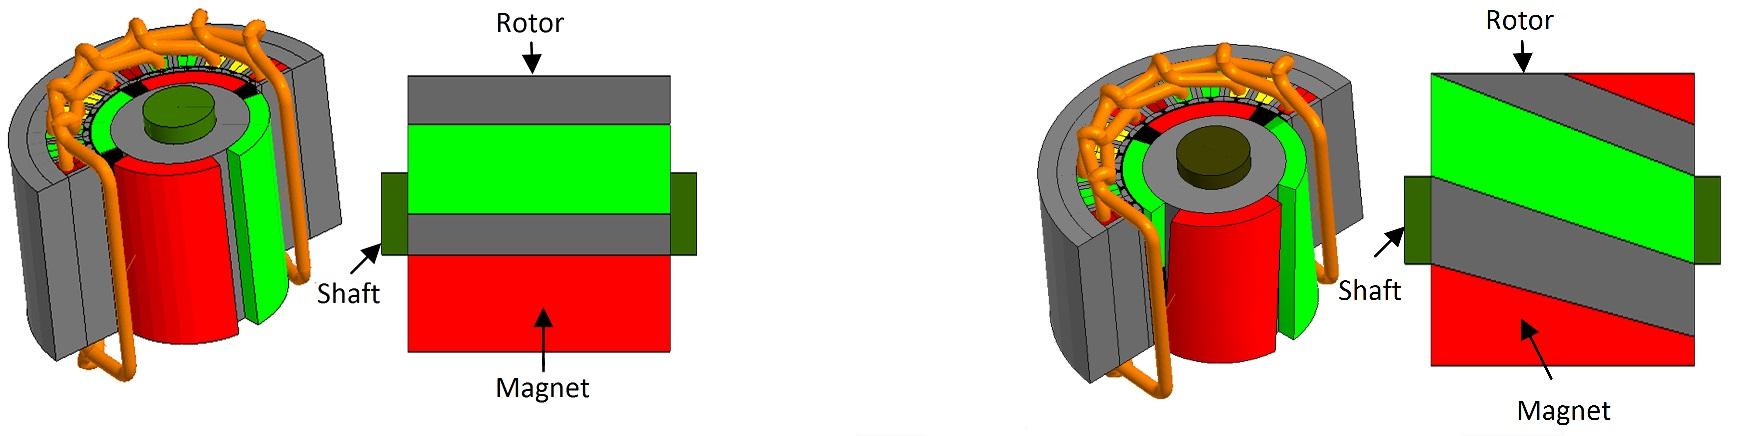 Skewed Synchronous Machine Design - Altair HyperWorks Insider